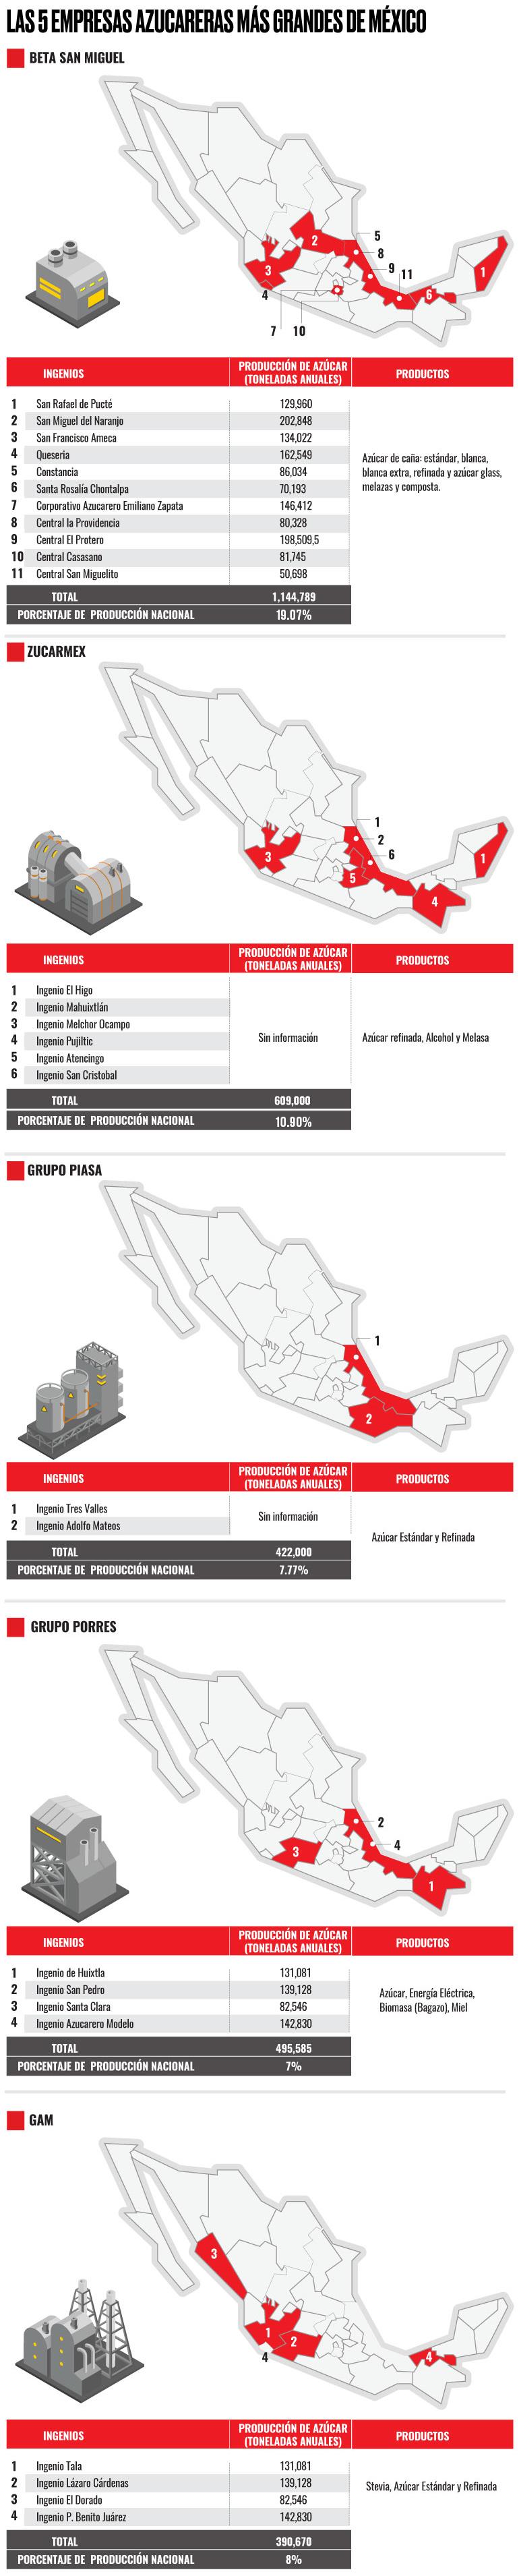 Qué pasará con las \'gigantes\' del azúcar en México? | Expansión.